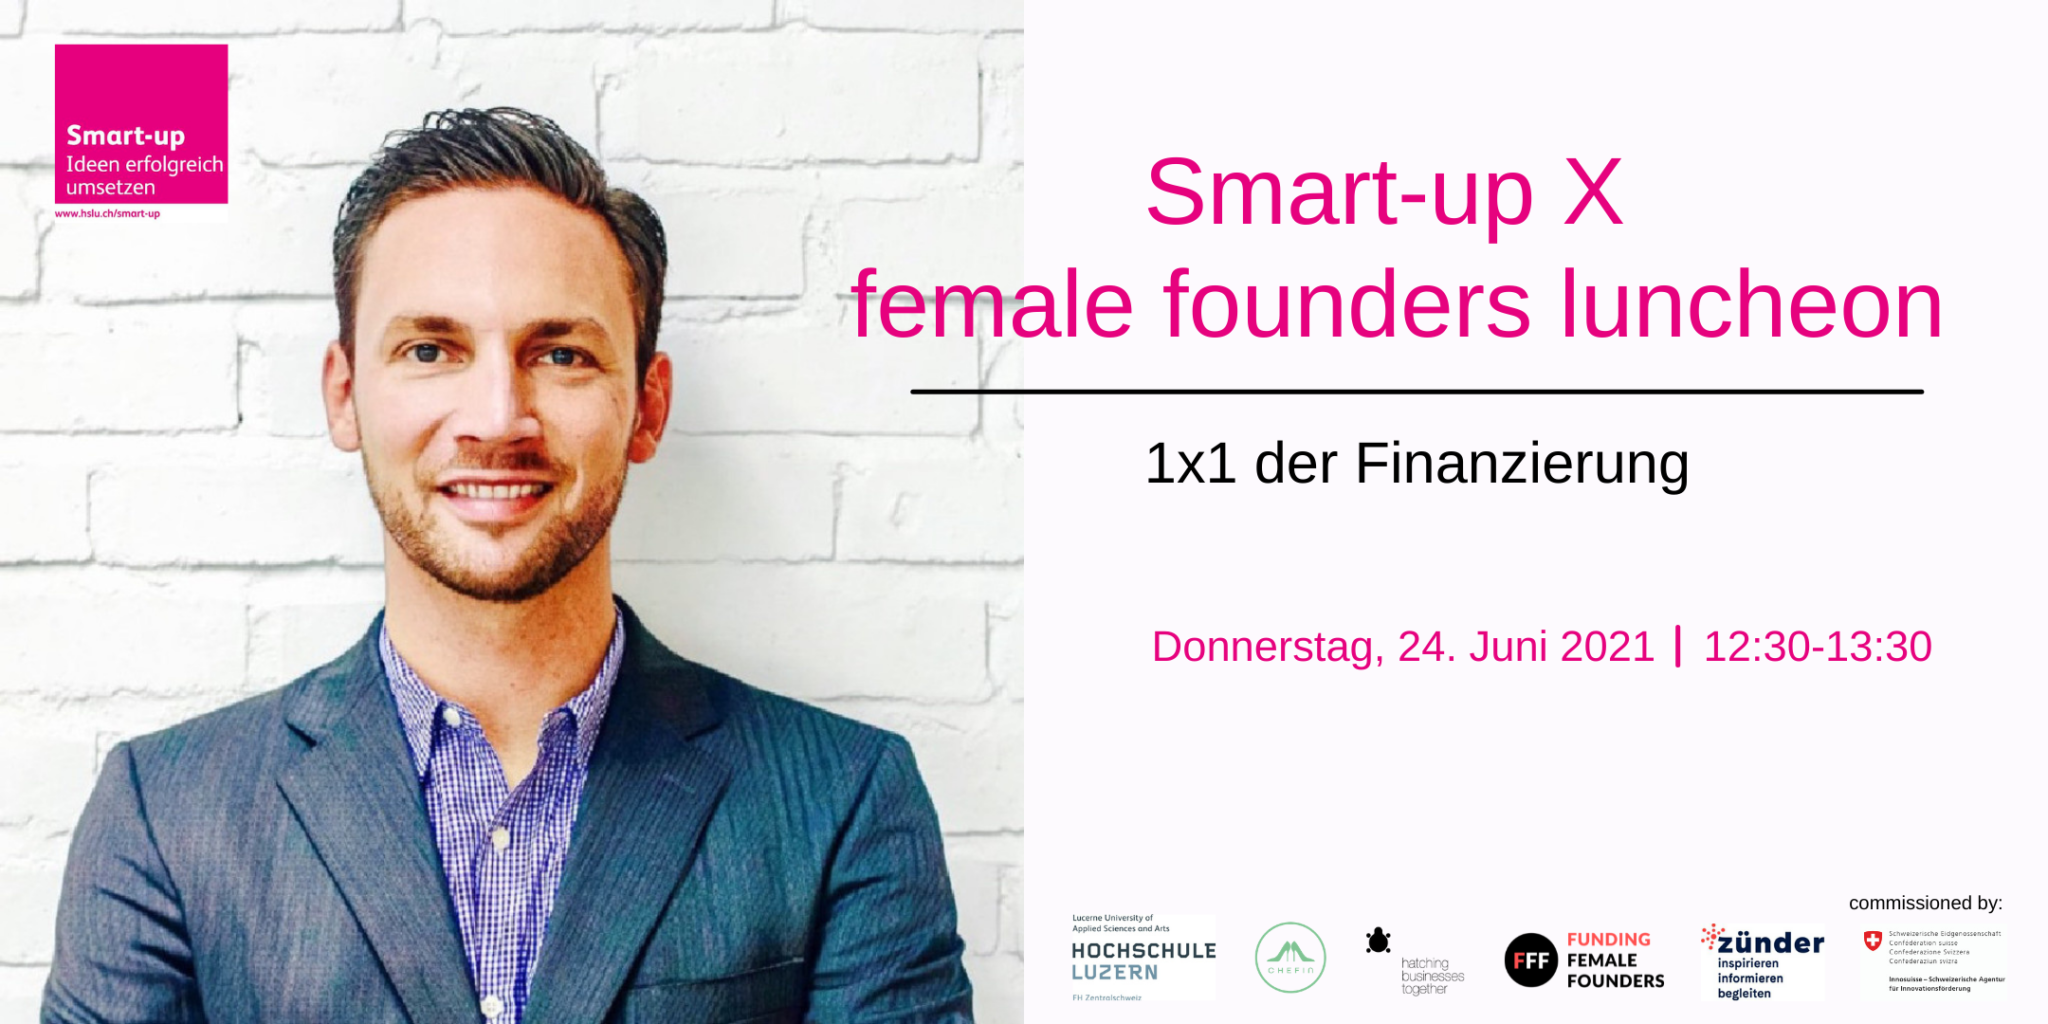 Recap Smart-up X female founders luncheon – 1×1 der Finanzierung